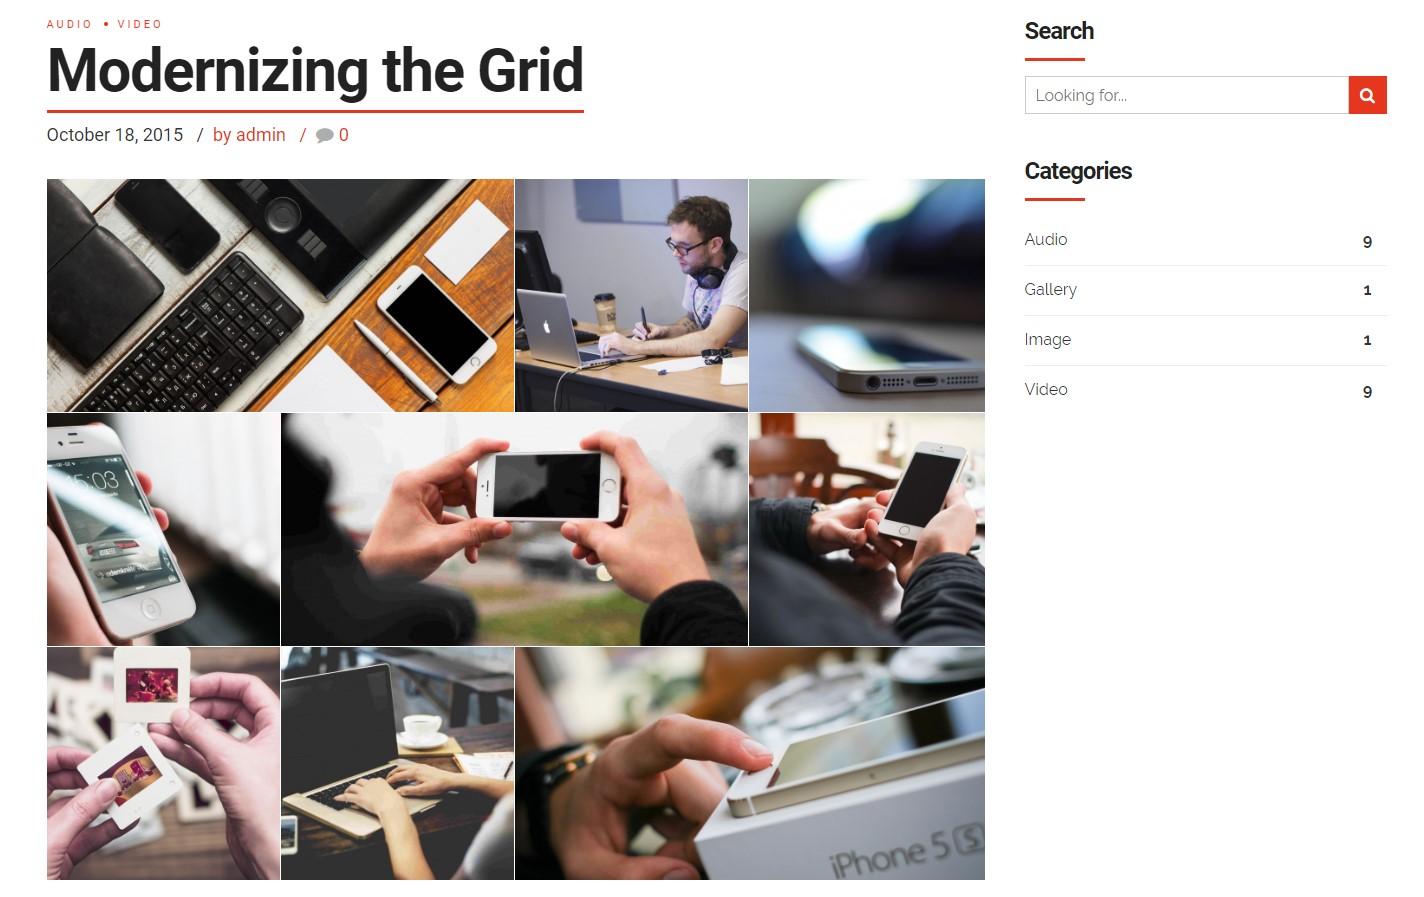 https://documentation.bold-themes.com/showcase/wp-content/uploads/sites/46/2019/09/grid-gallery.jpg